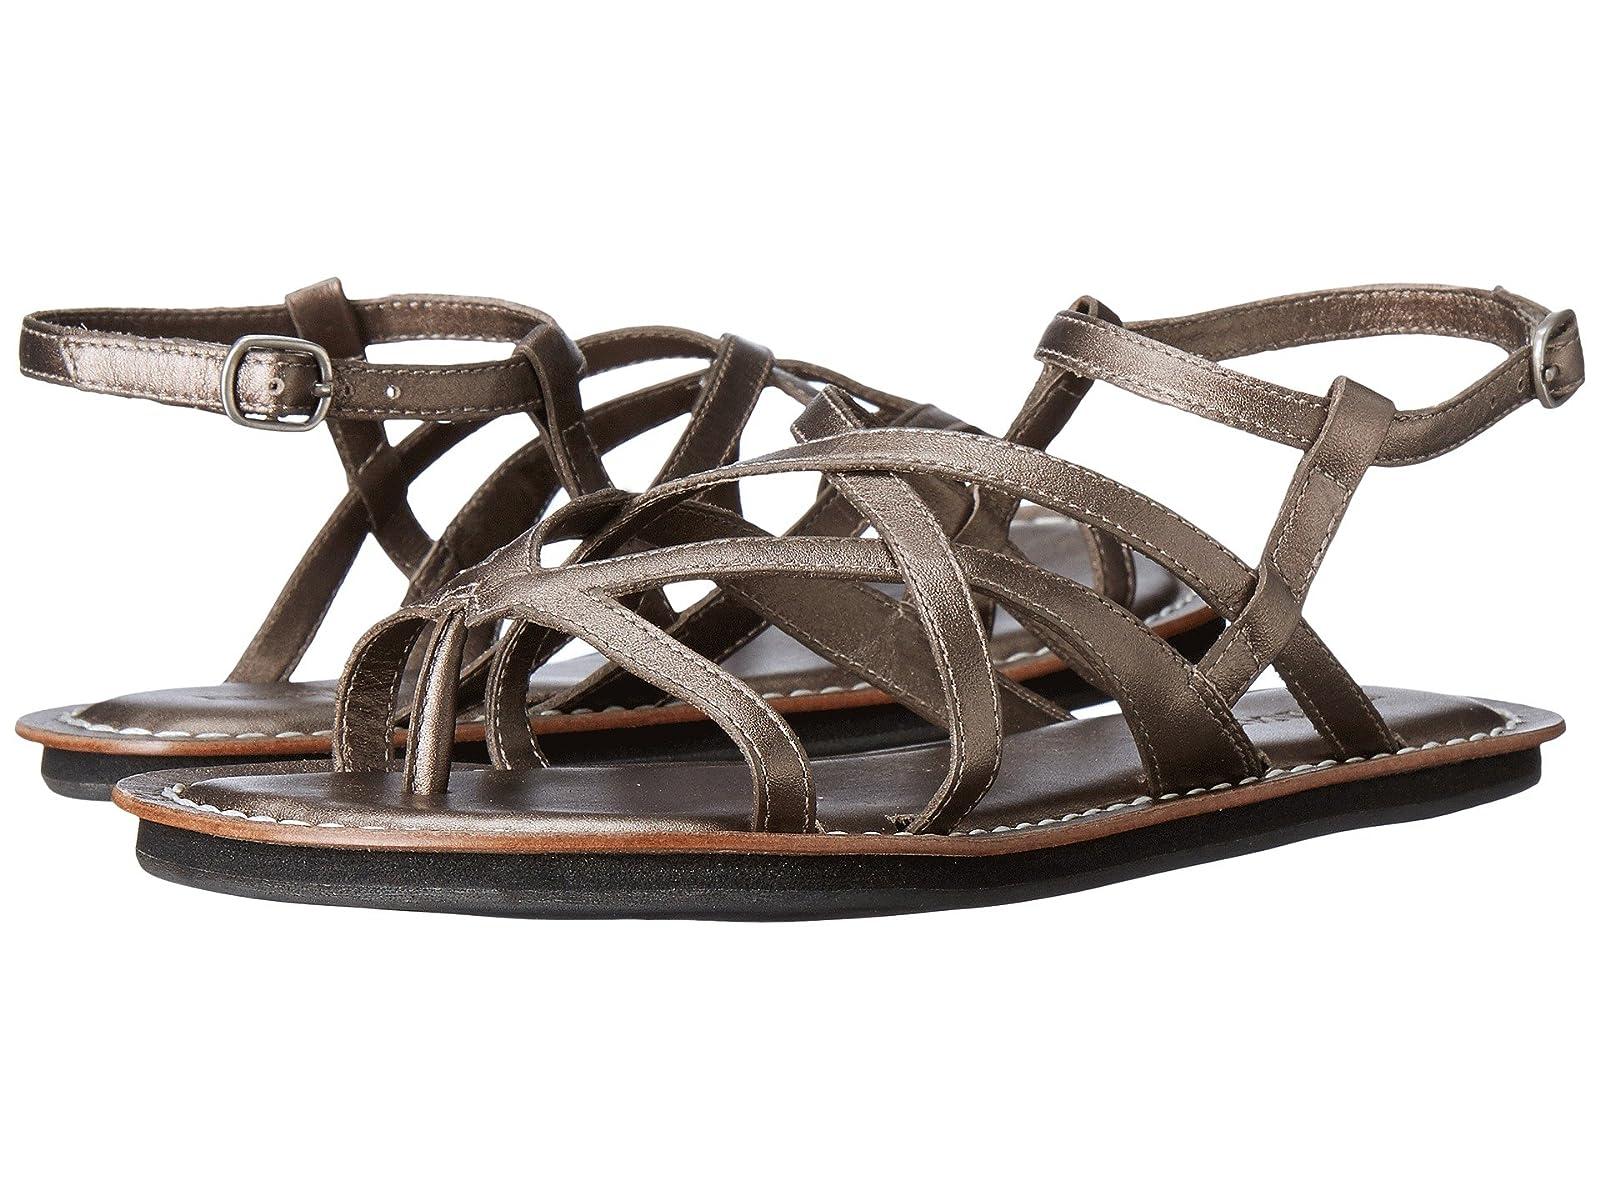 Bernardo CaraCheap and distinctive eye-catching shoes